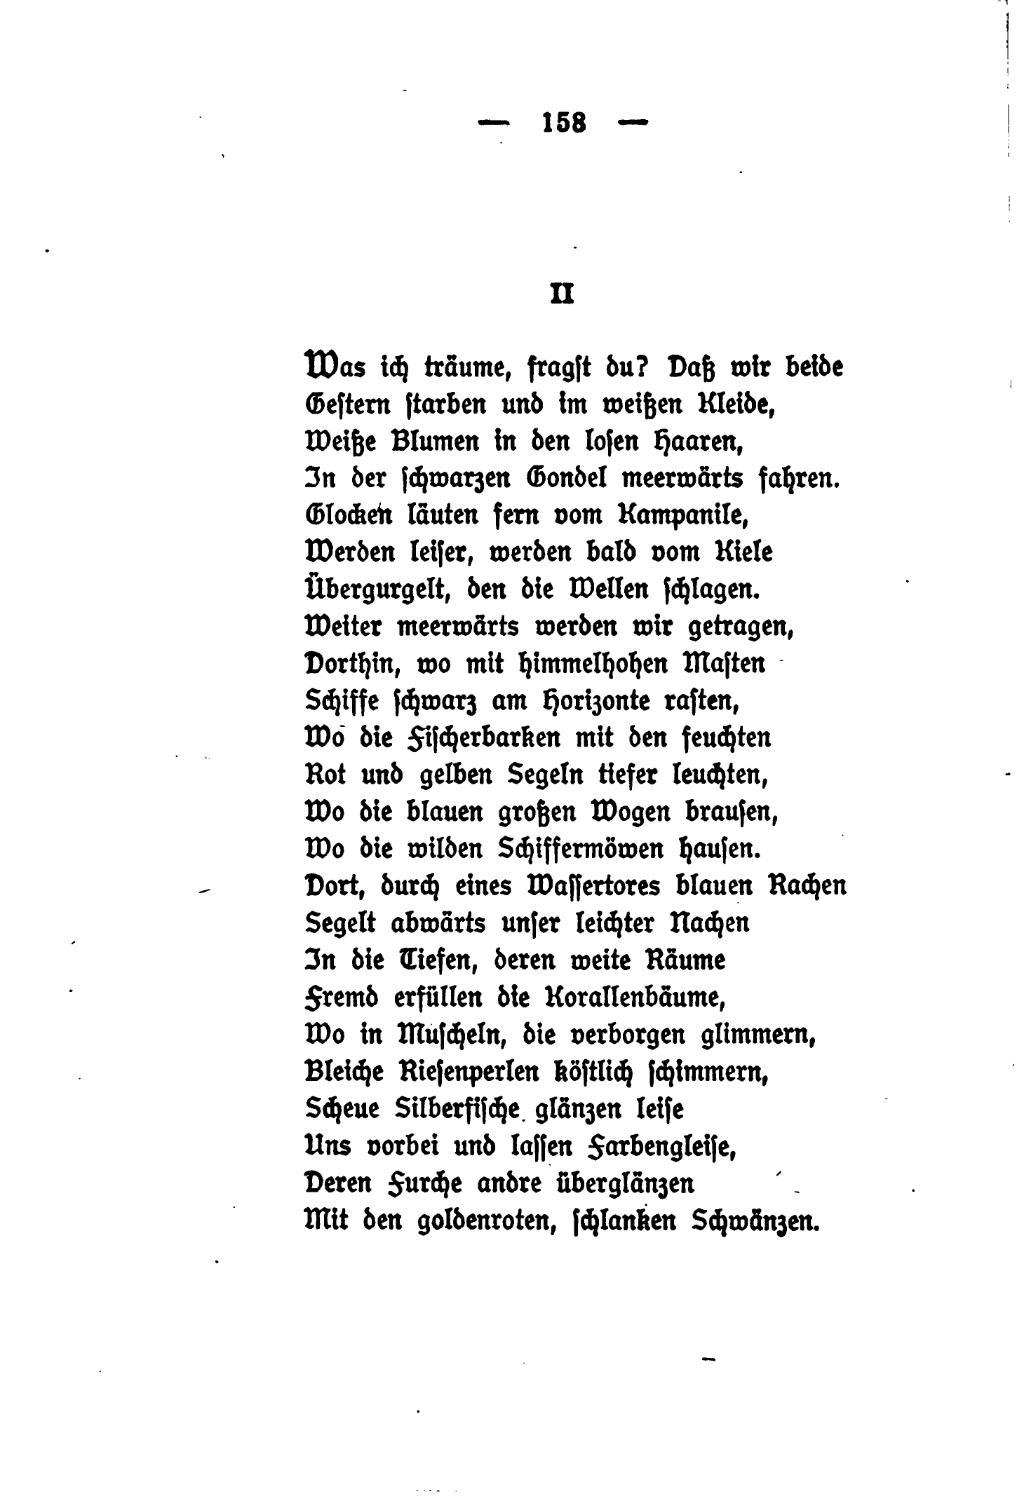 Pagegedichte Hesse 1919djvu165 Wikisource